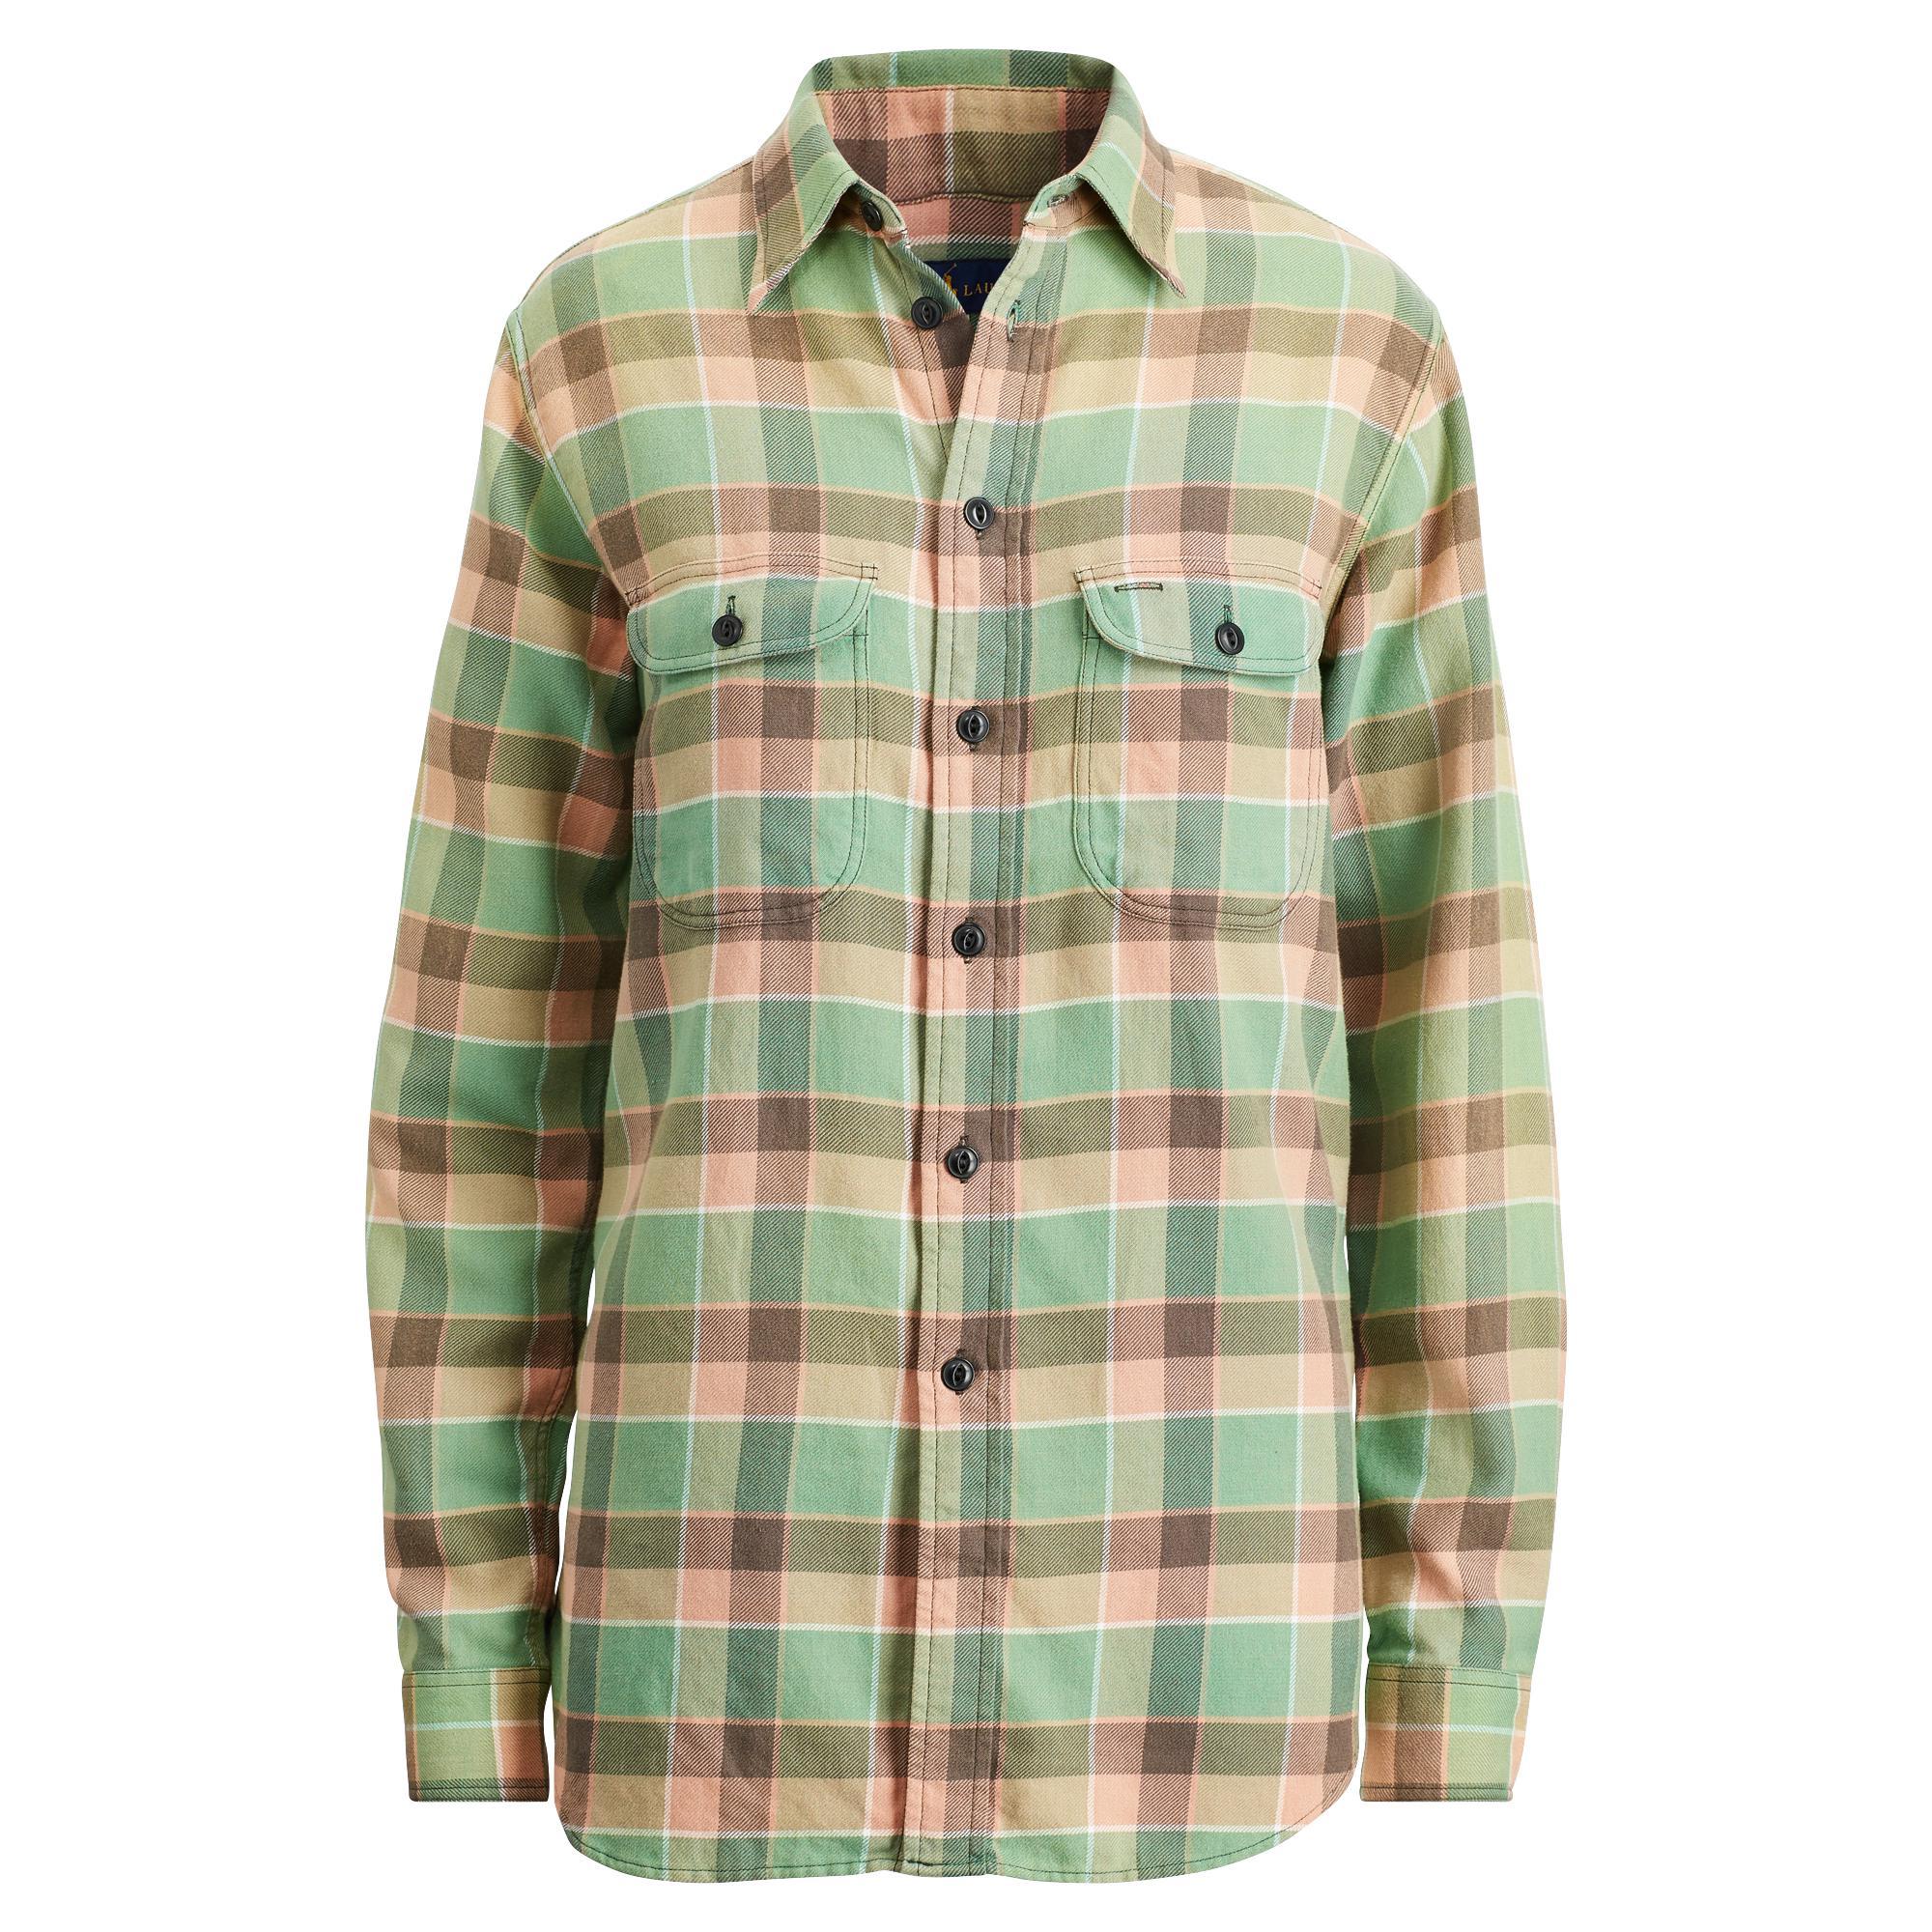 c2e2192b9 Ralph Lauren Collection Paxton Plaid Cotton Shirt in Green - Lyst